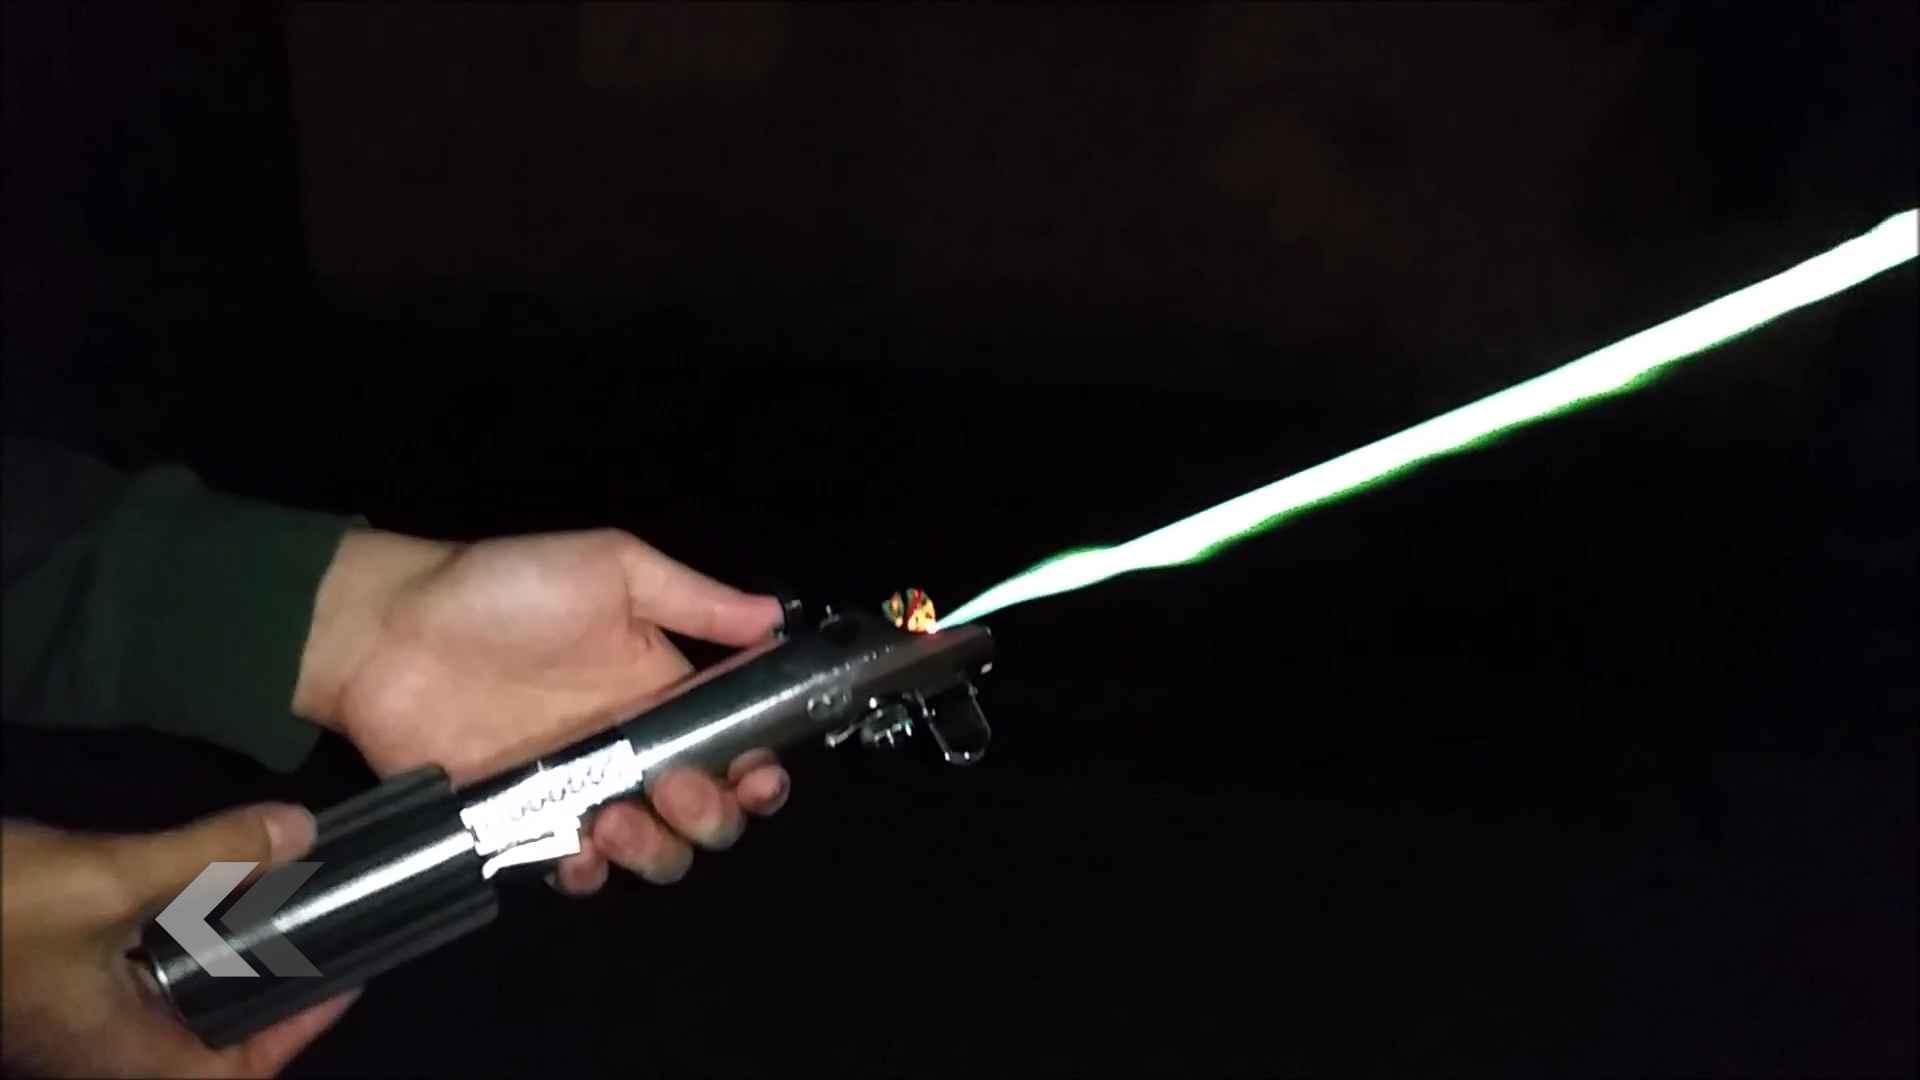 vrai-sabre-laser-star-wars-11670